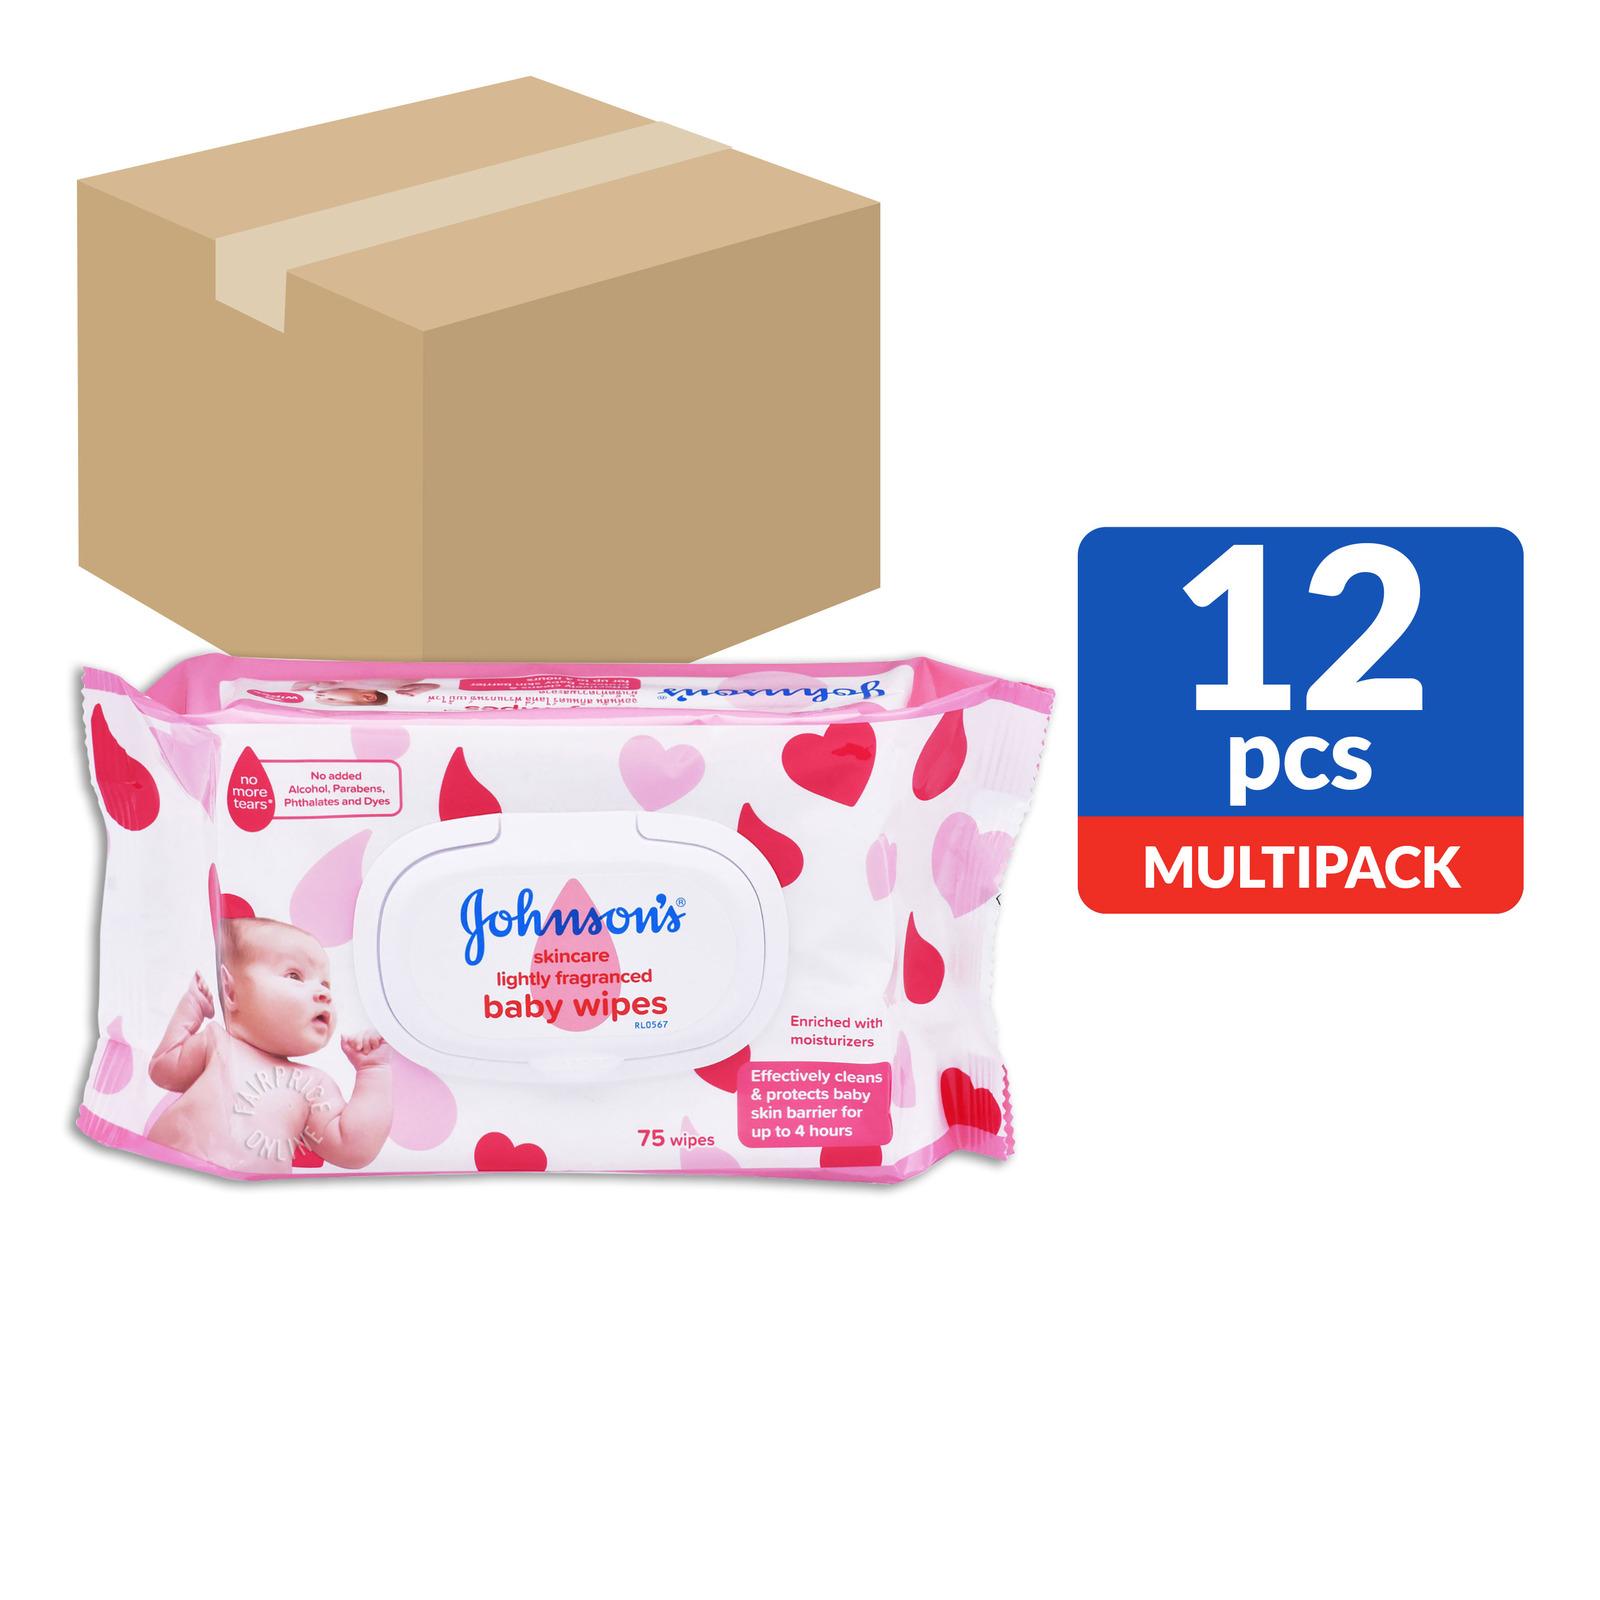 Johnson's Baby Wipes - Lightly Fragranced